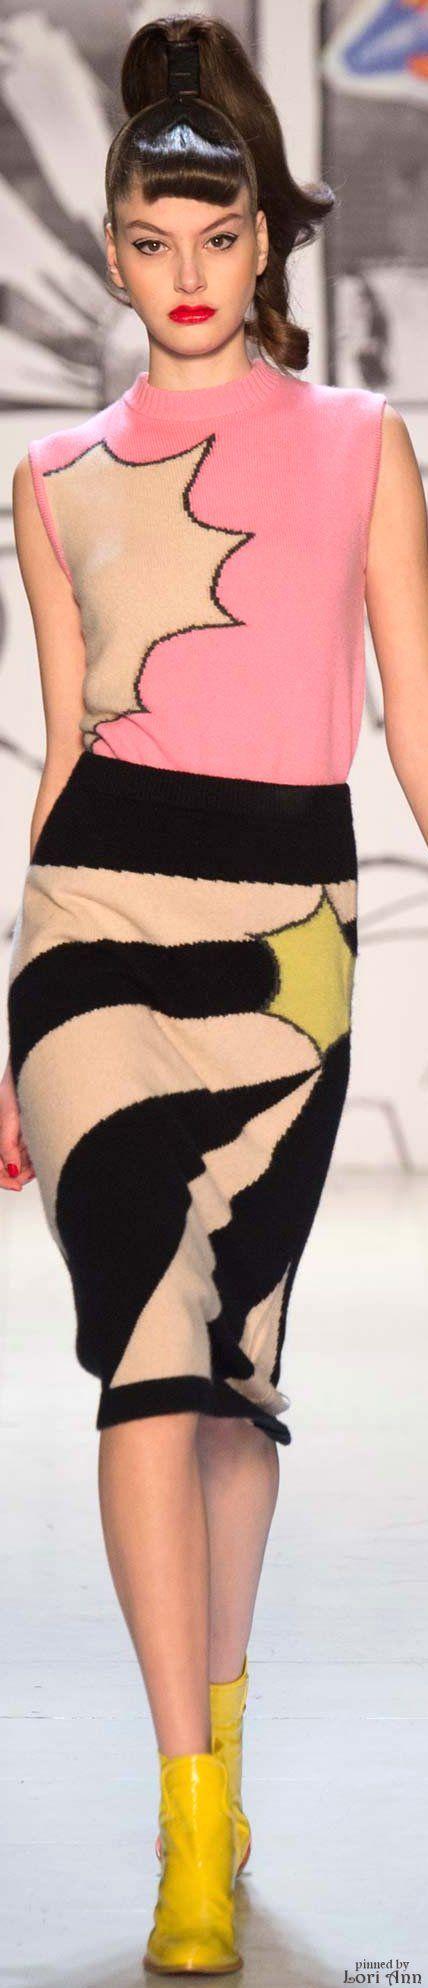 http://ura19627.jeunesseglobal.com/Share.aspx Color fashion Glam / Tsumori Chisato Fall 2015 RTW